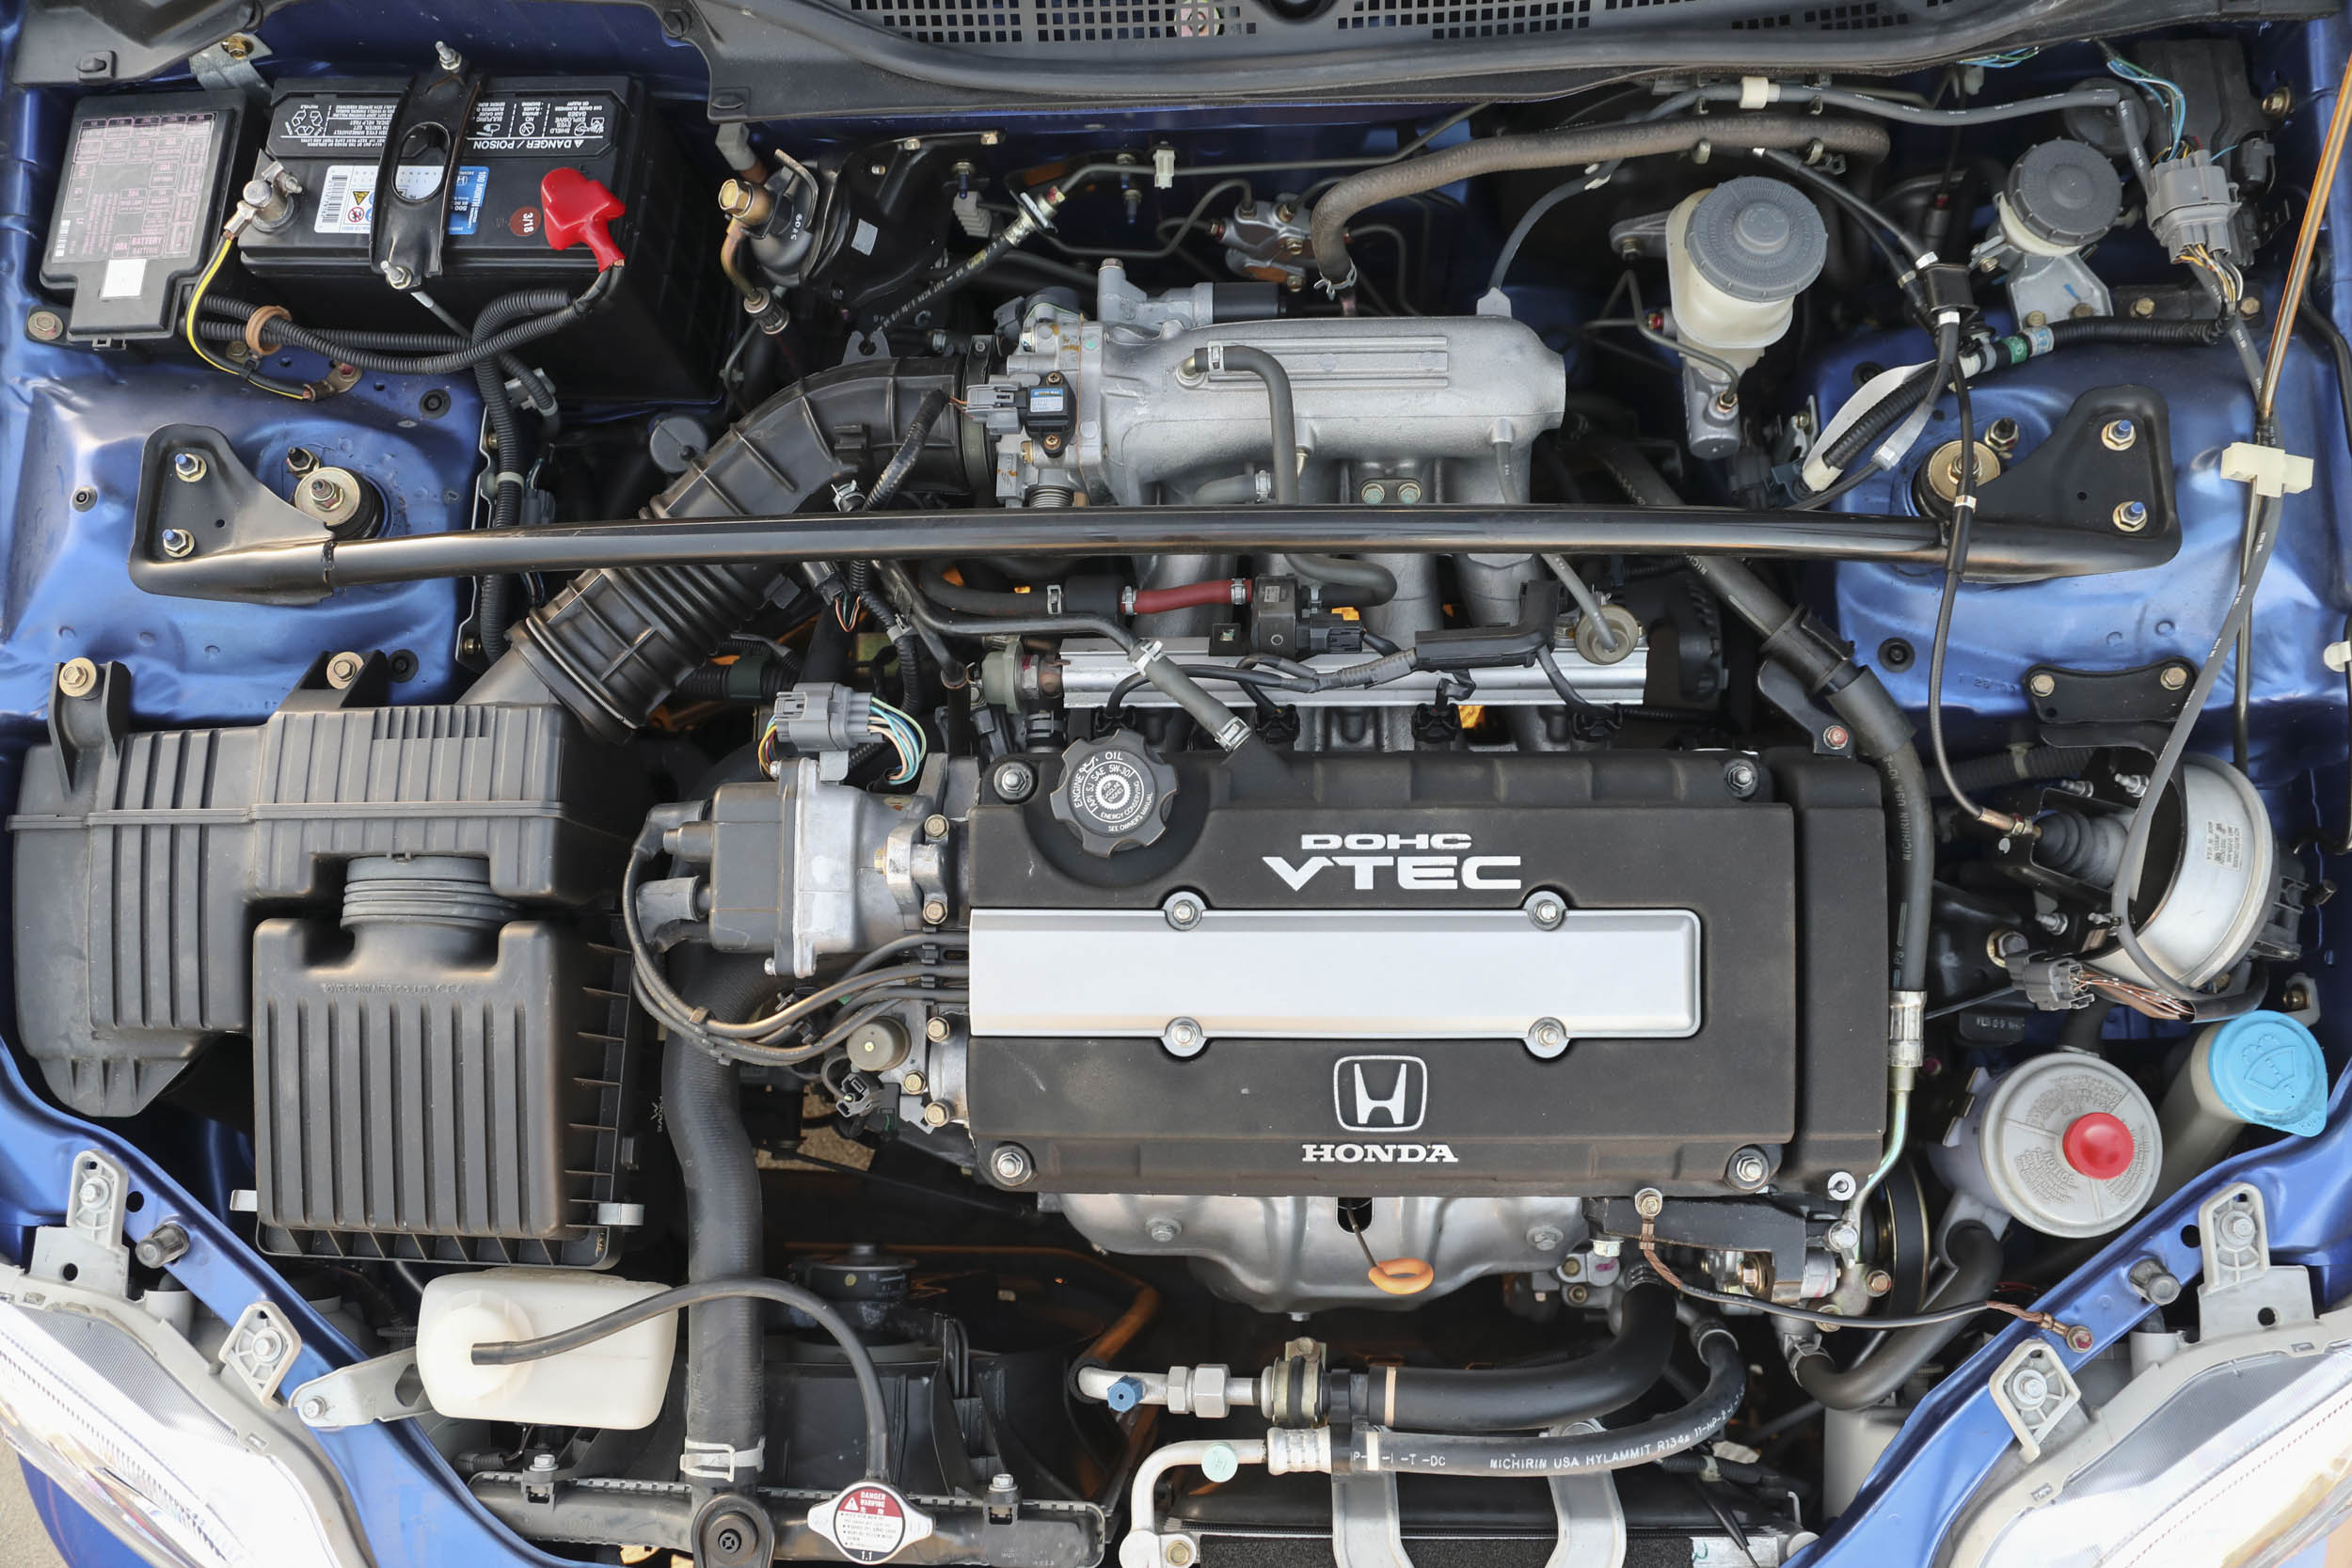 images?q=tbn:ANd9GcQh_l3eQ5xwiPy07kGEXjmjgmBKBRB7H2mRxCGhv1tFWg5c_mWT Engine Bay Honda Civic Engine Parts Diagram